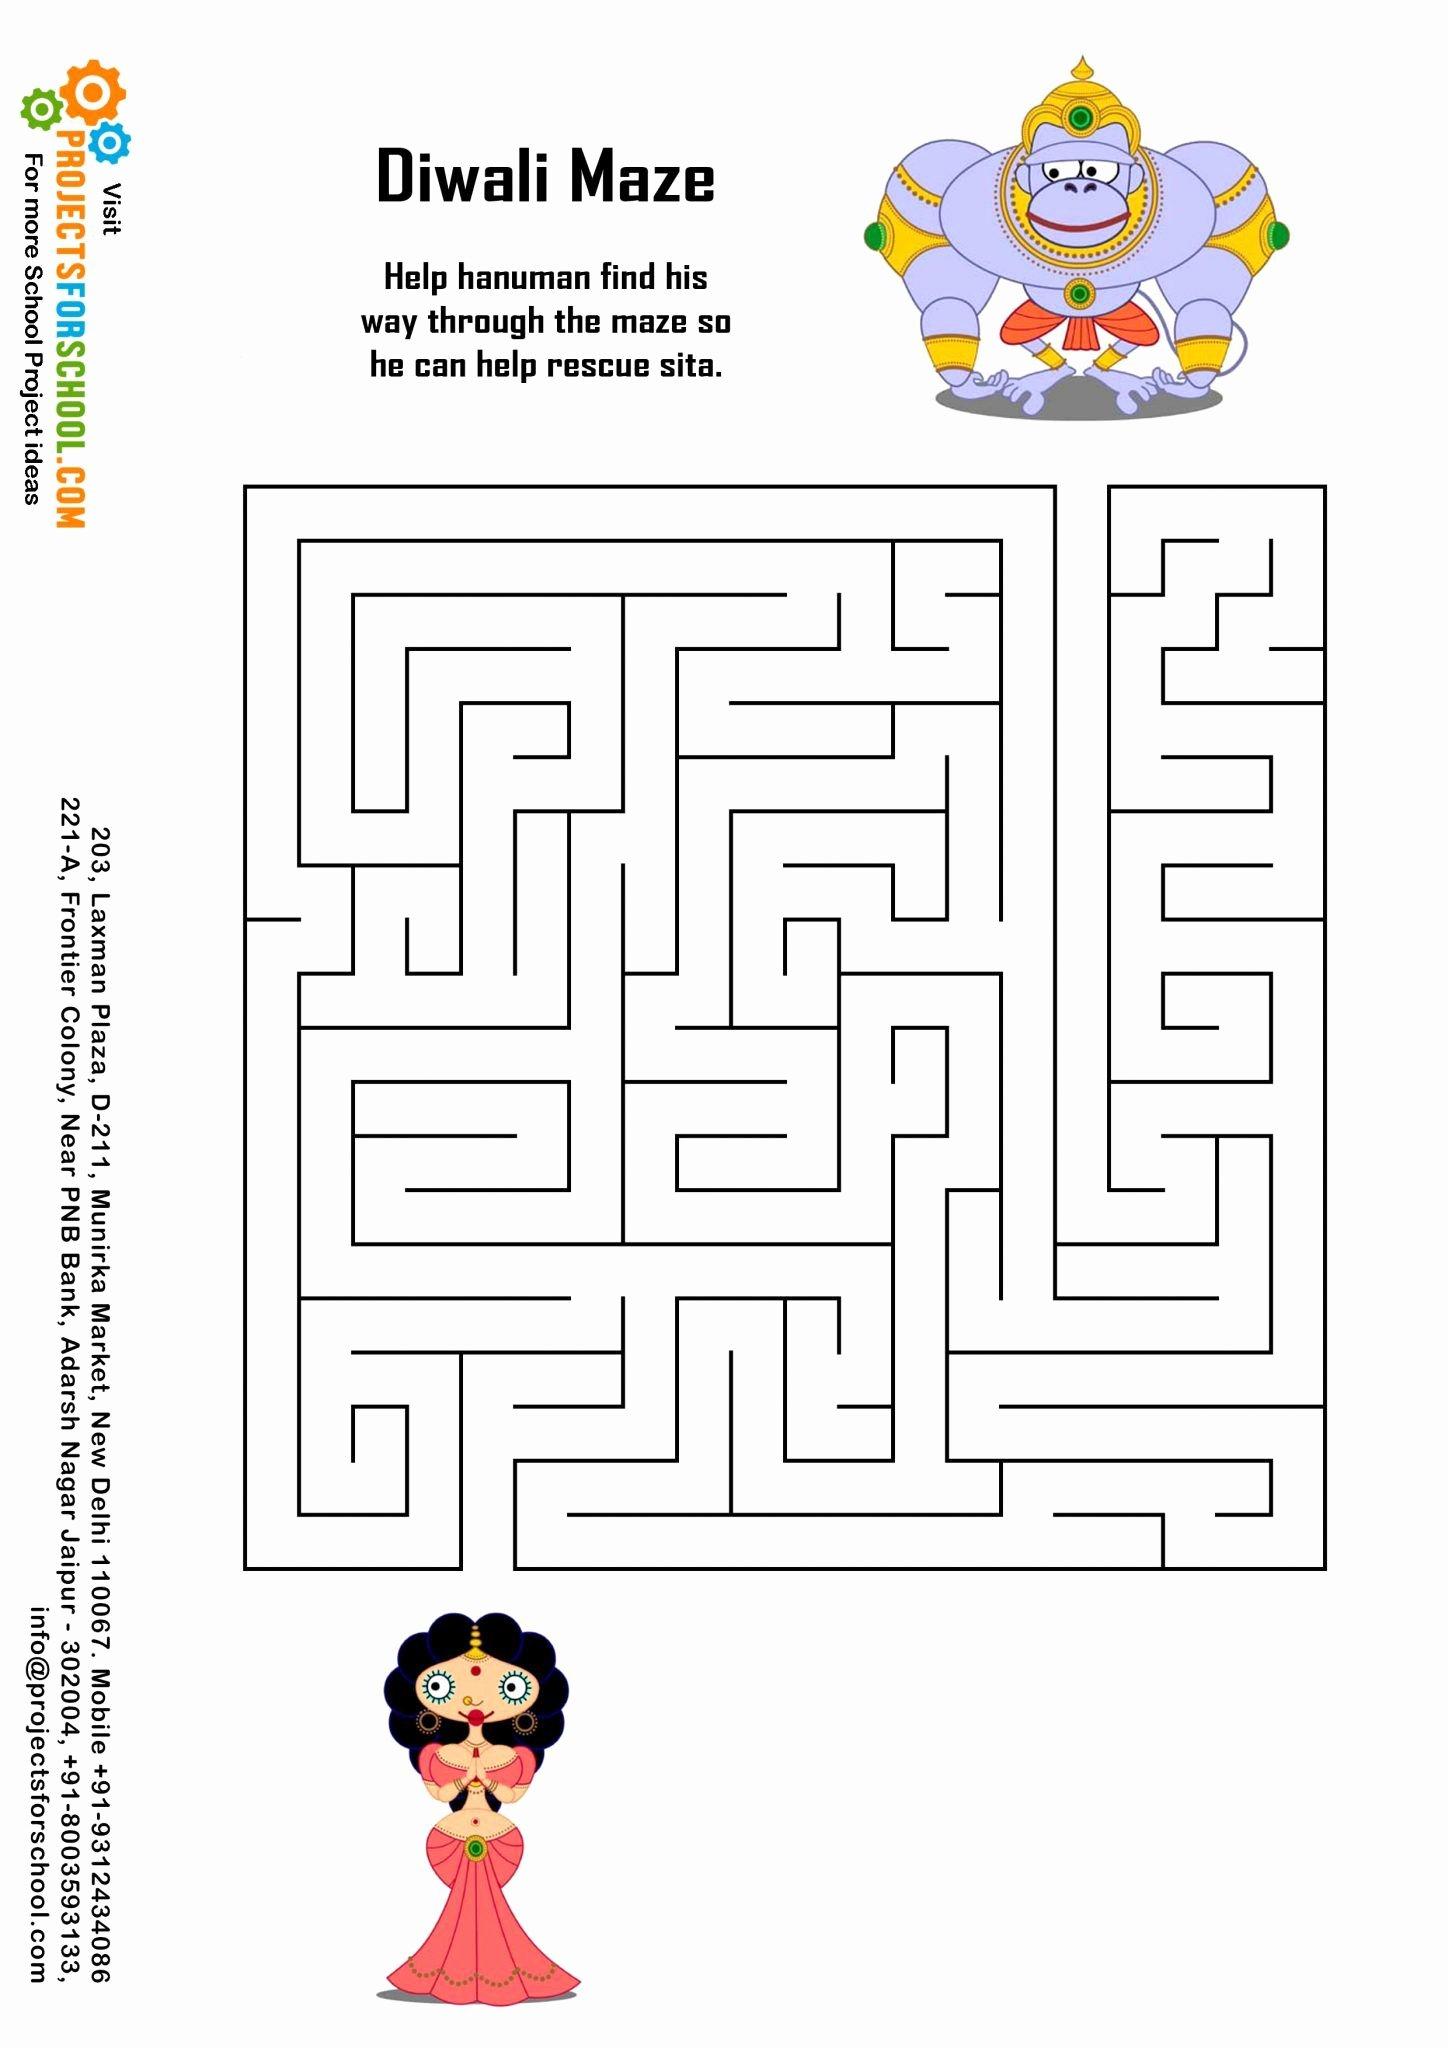 Diwali Worksheets for Preschoolers Lovely Kids Science Projects Diwali Maze Free